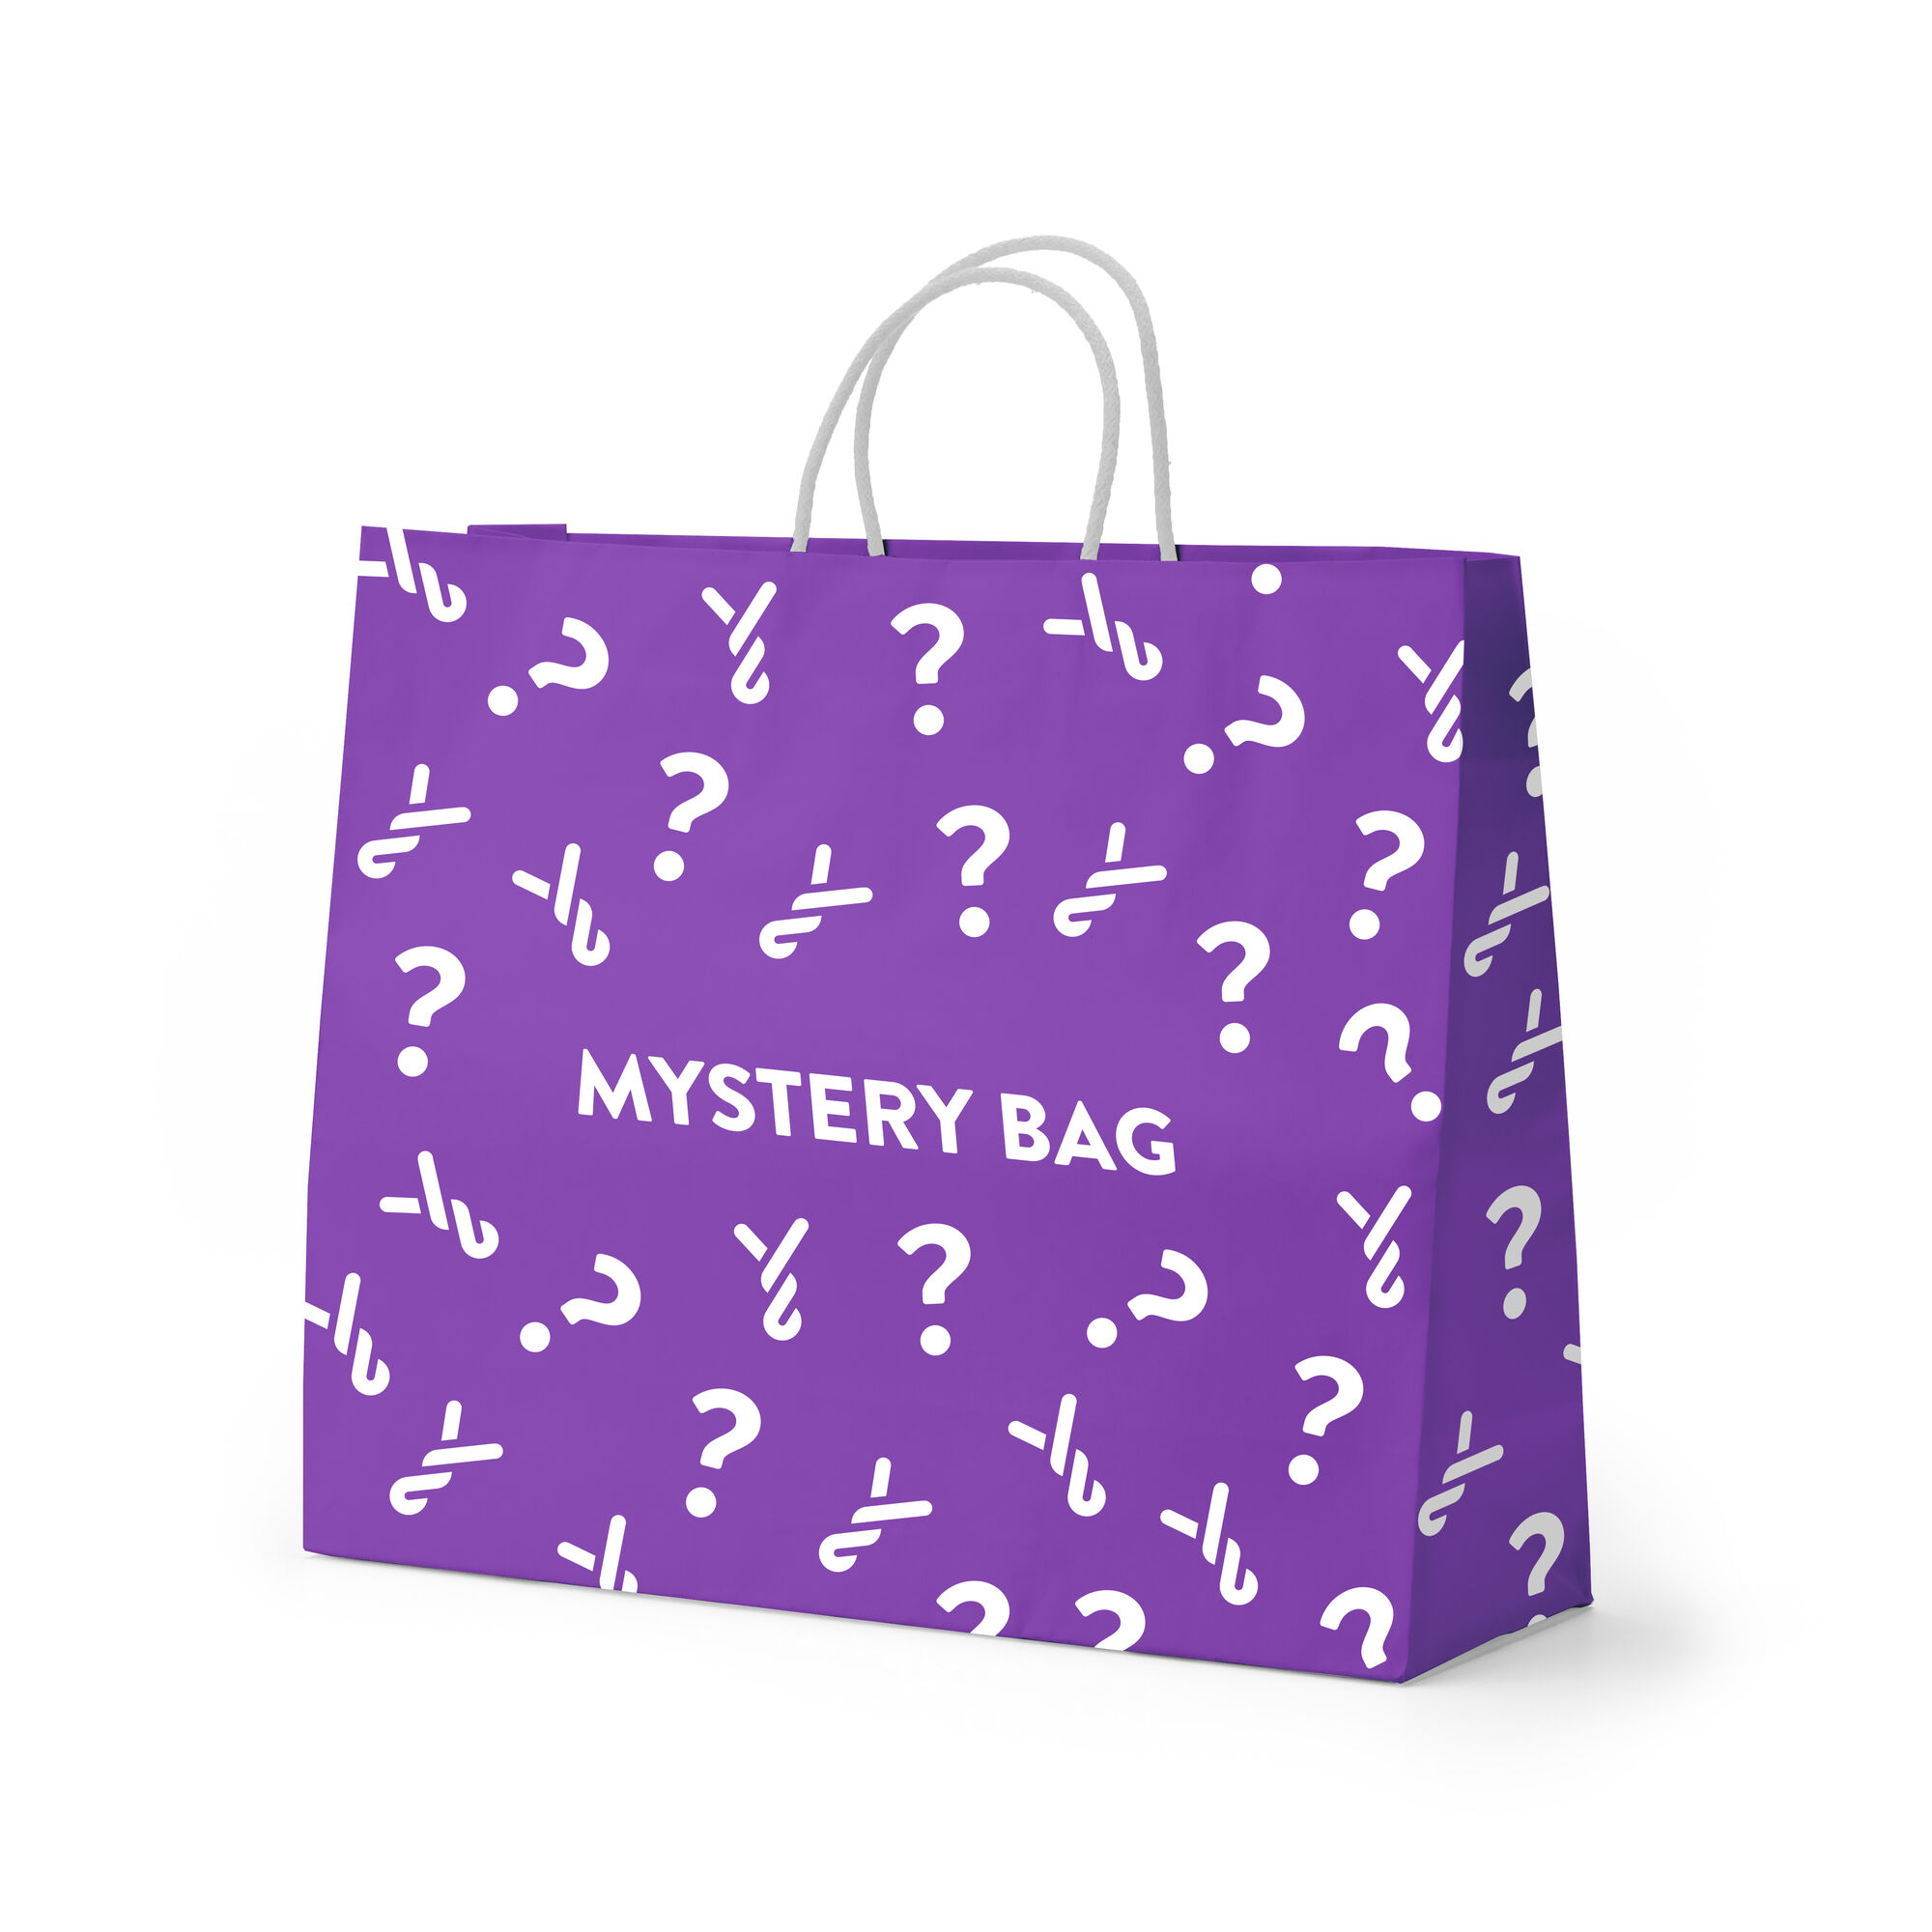 Yarnspirations Mystery Bag, 1 Lb. Of Yarn